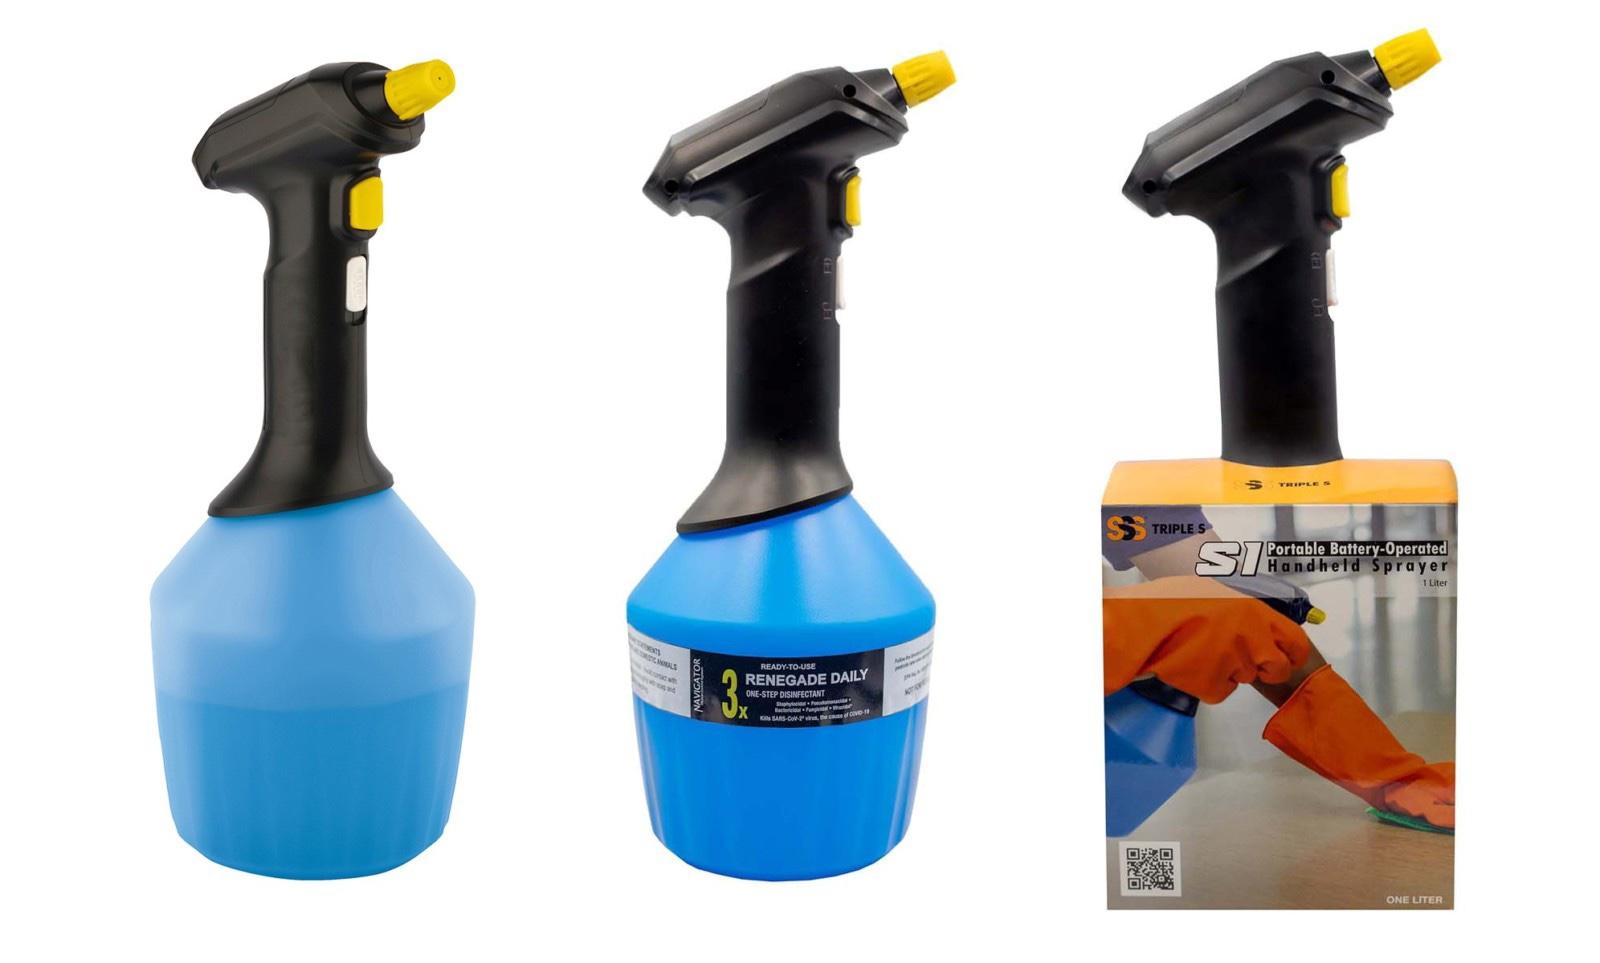 Triple-S   Portable Battery Powered Handheld Sprayer